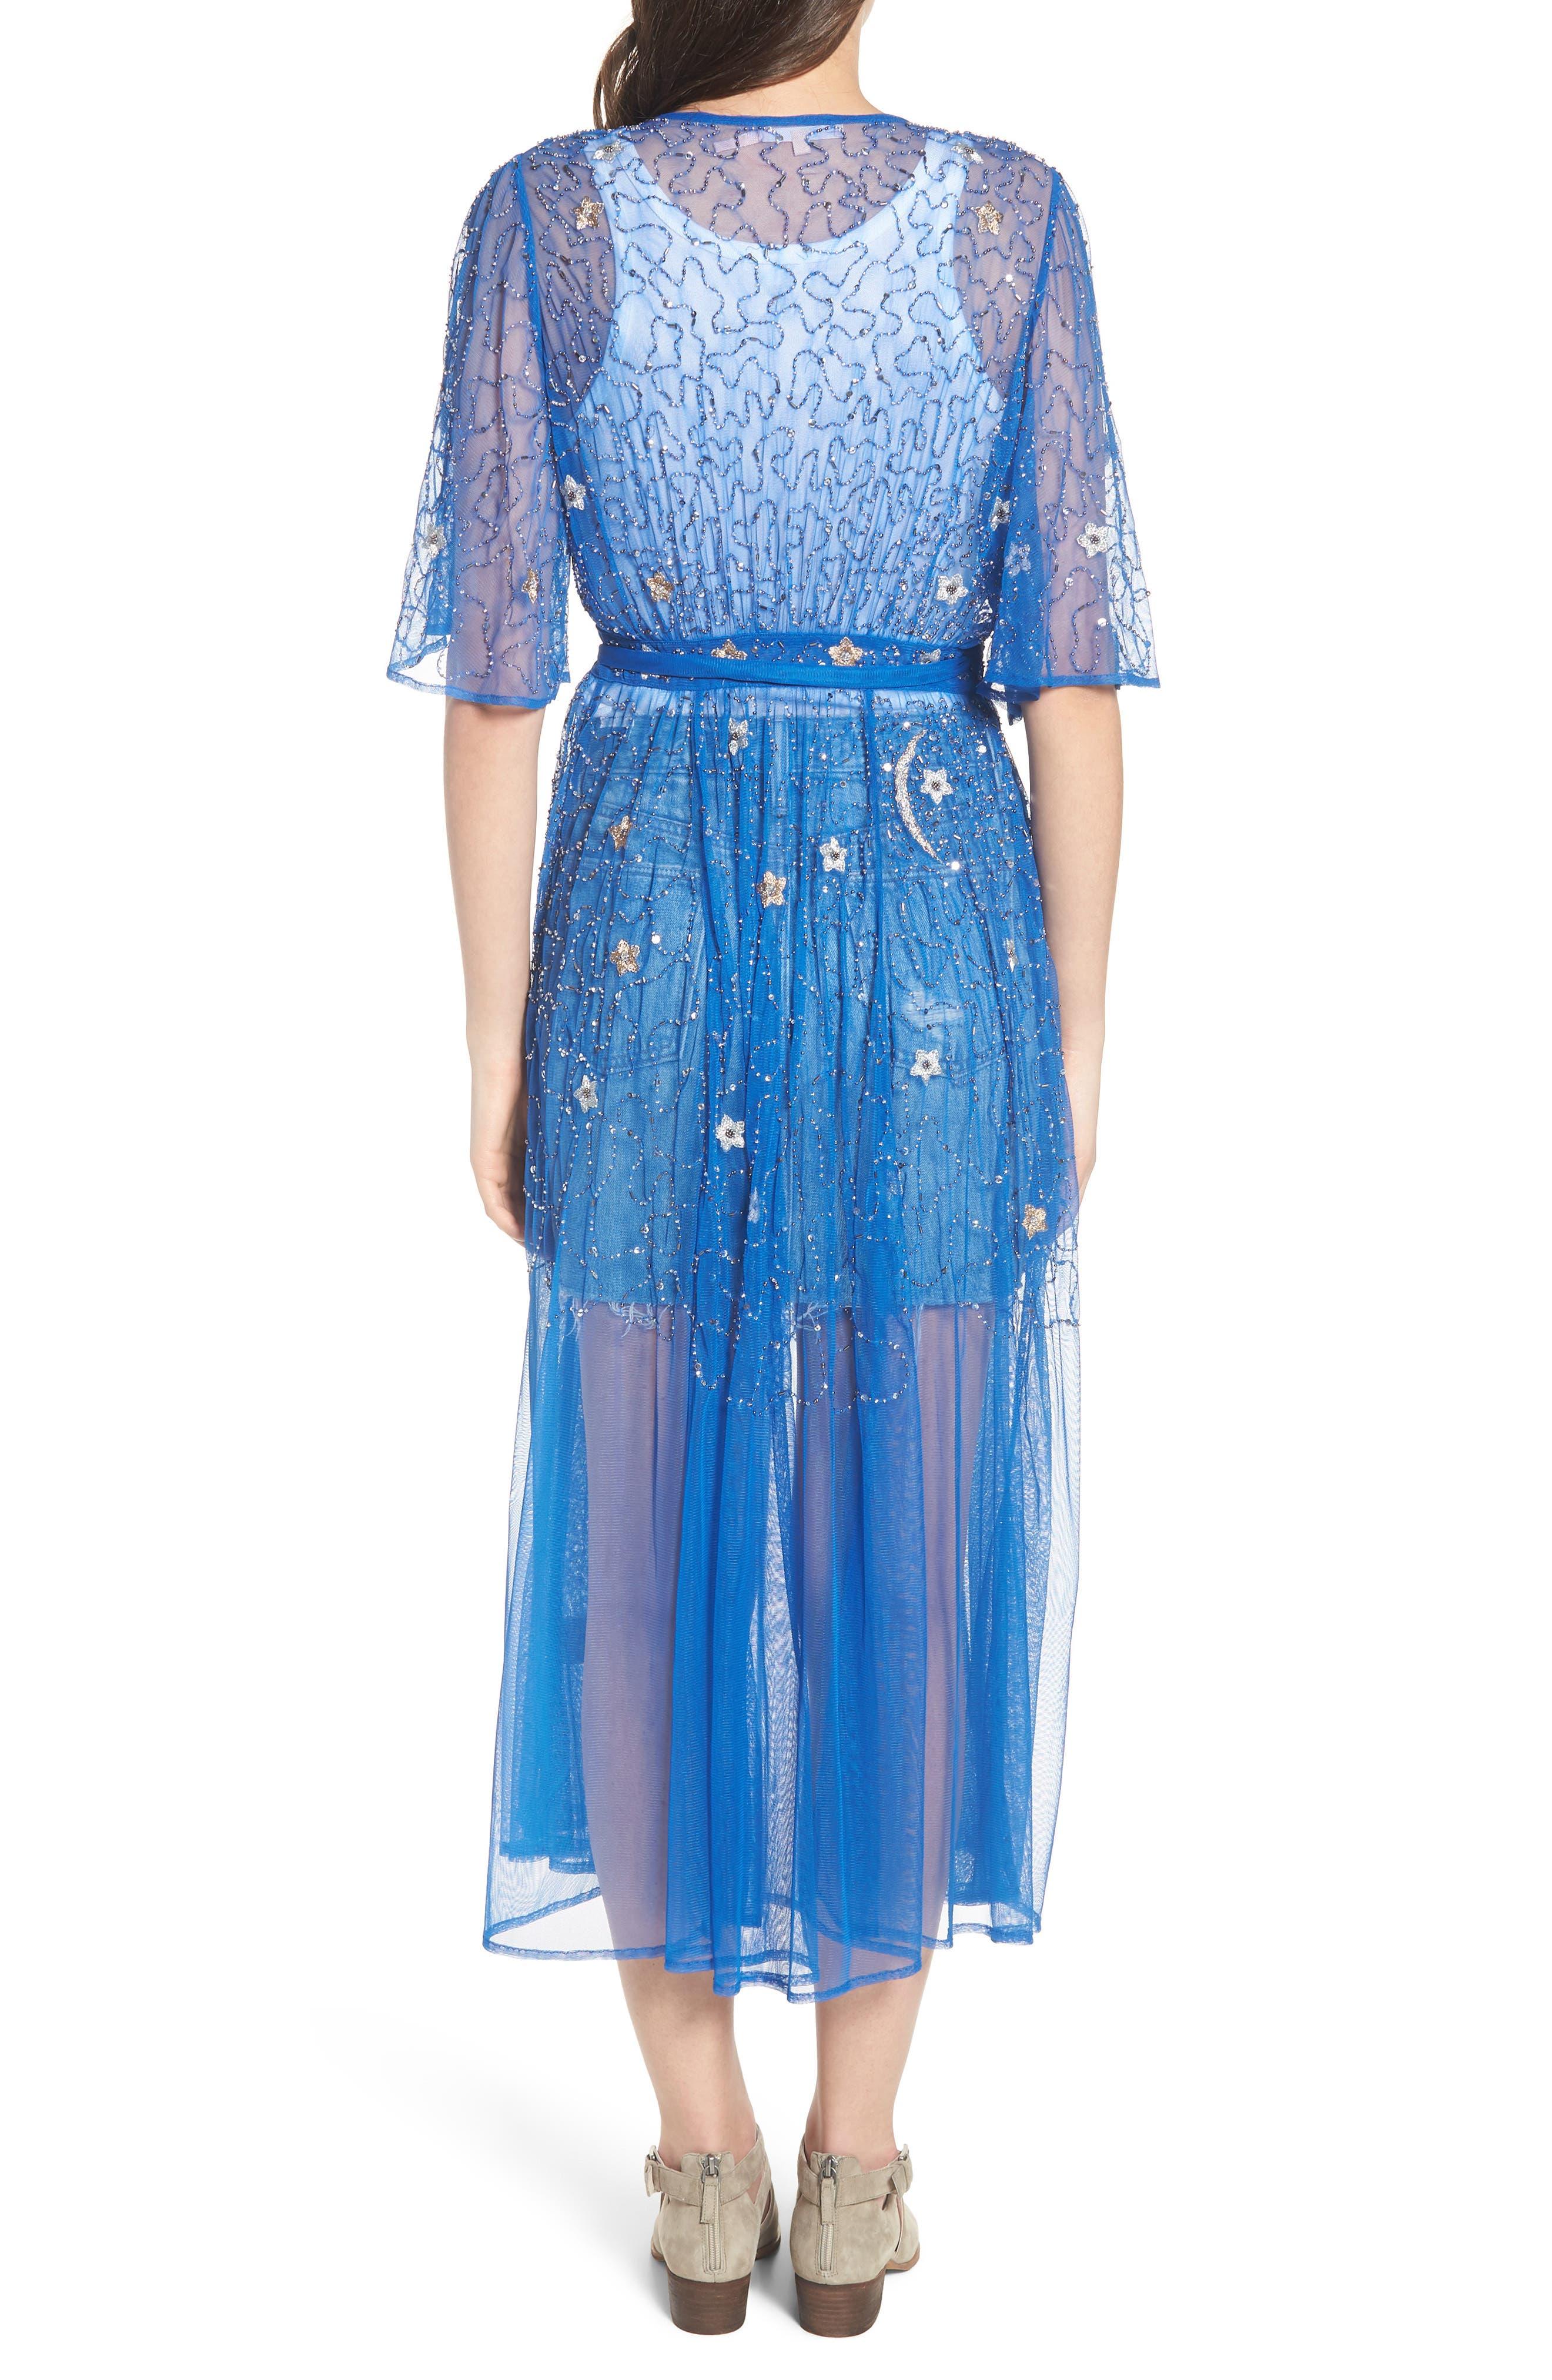 Stargazer Kimono,                             Alternate thumbnail 2, color,                             LAPIZ BLUE